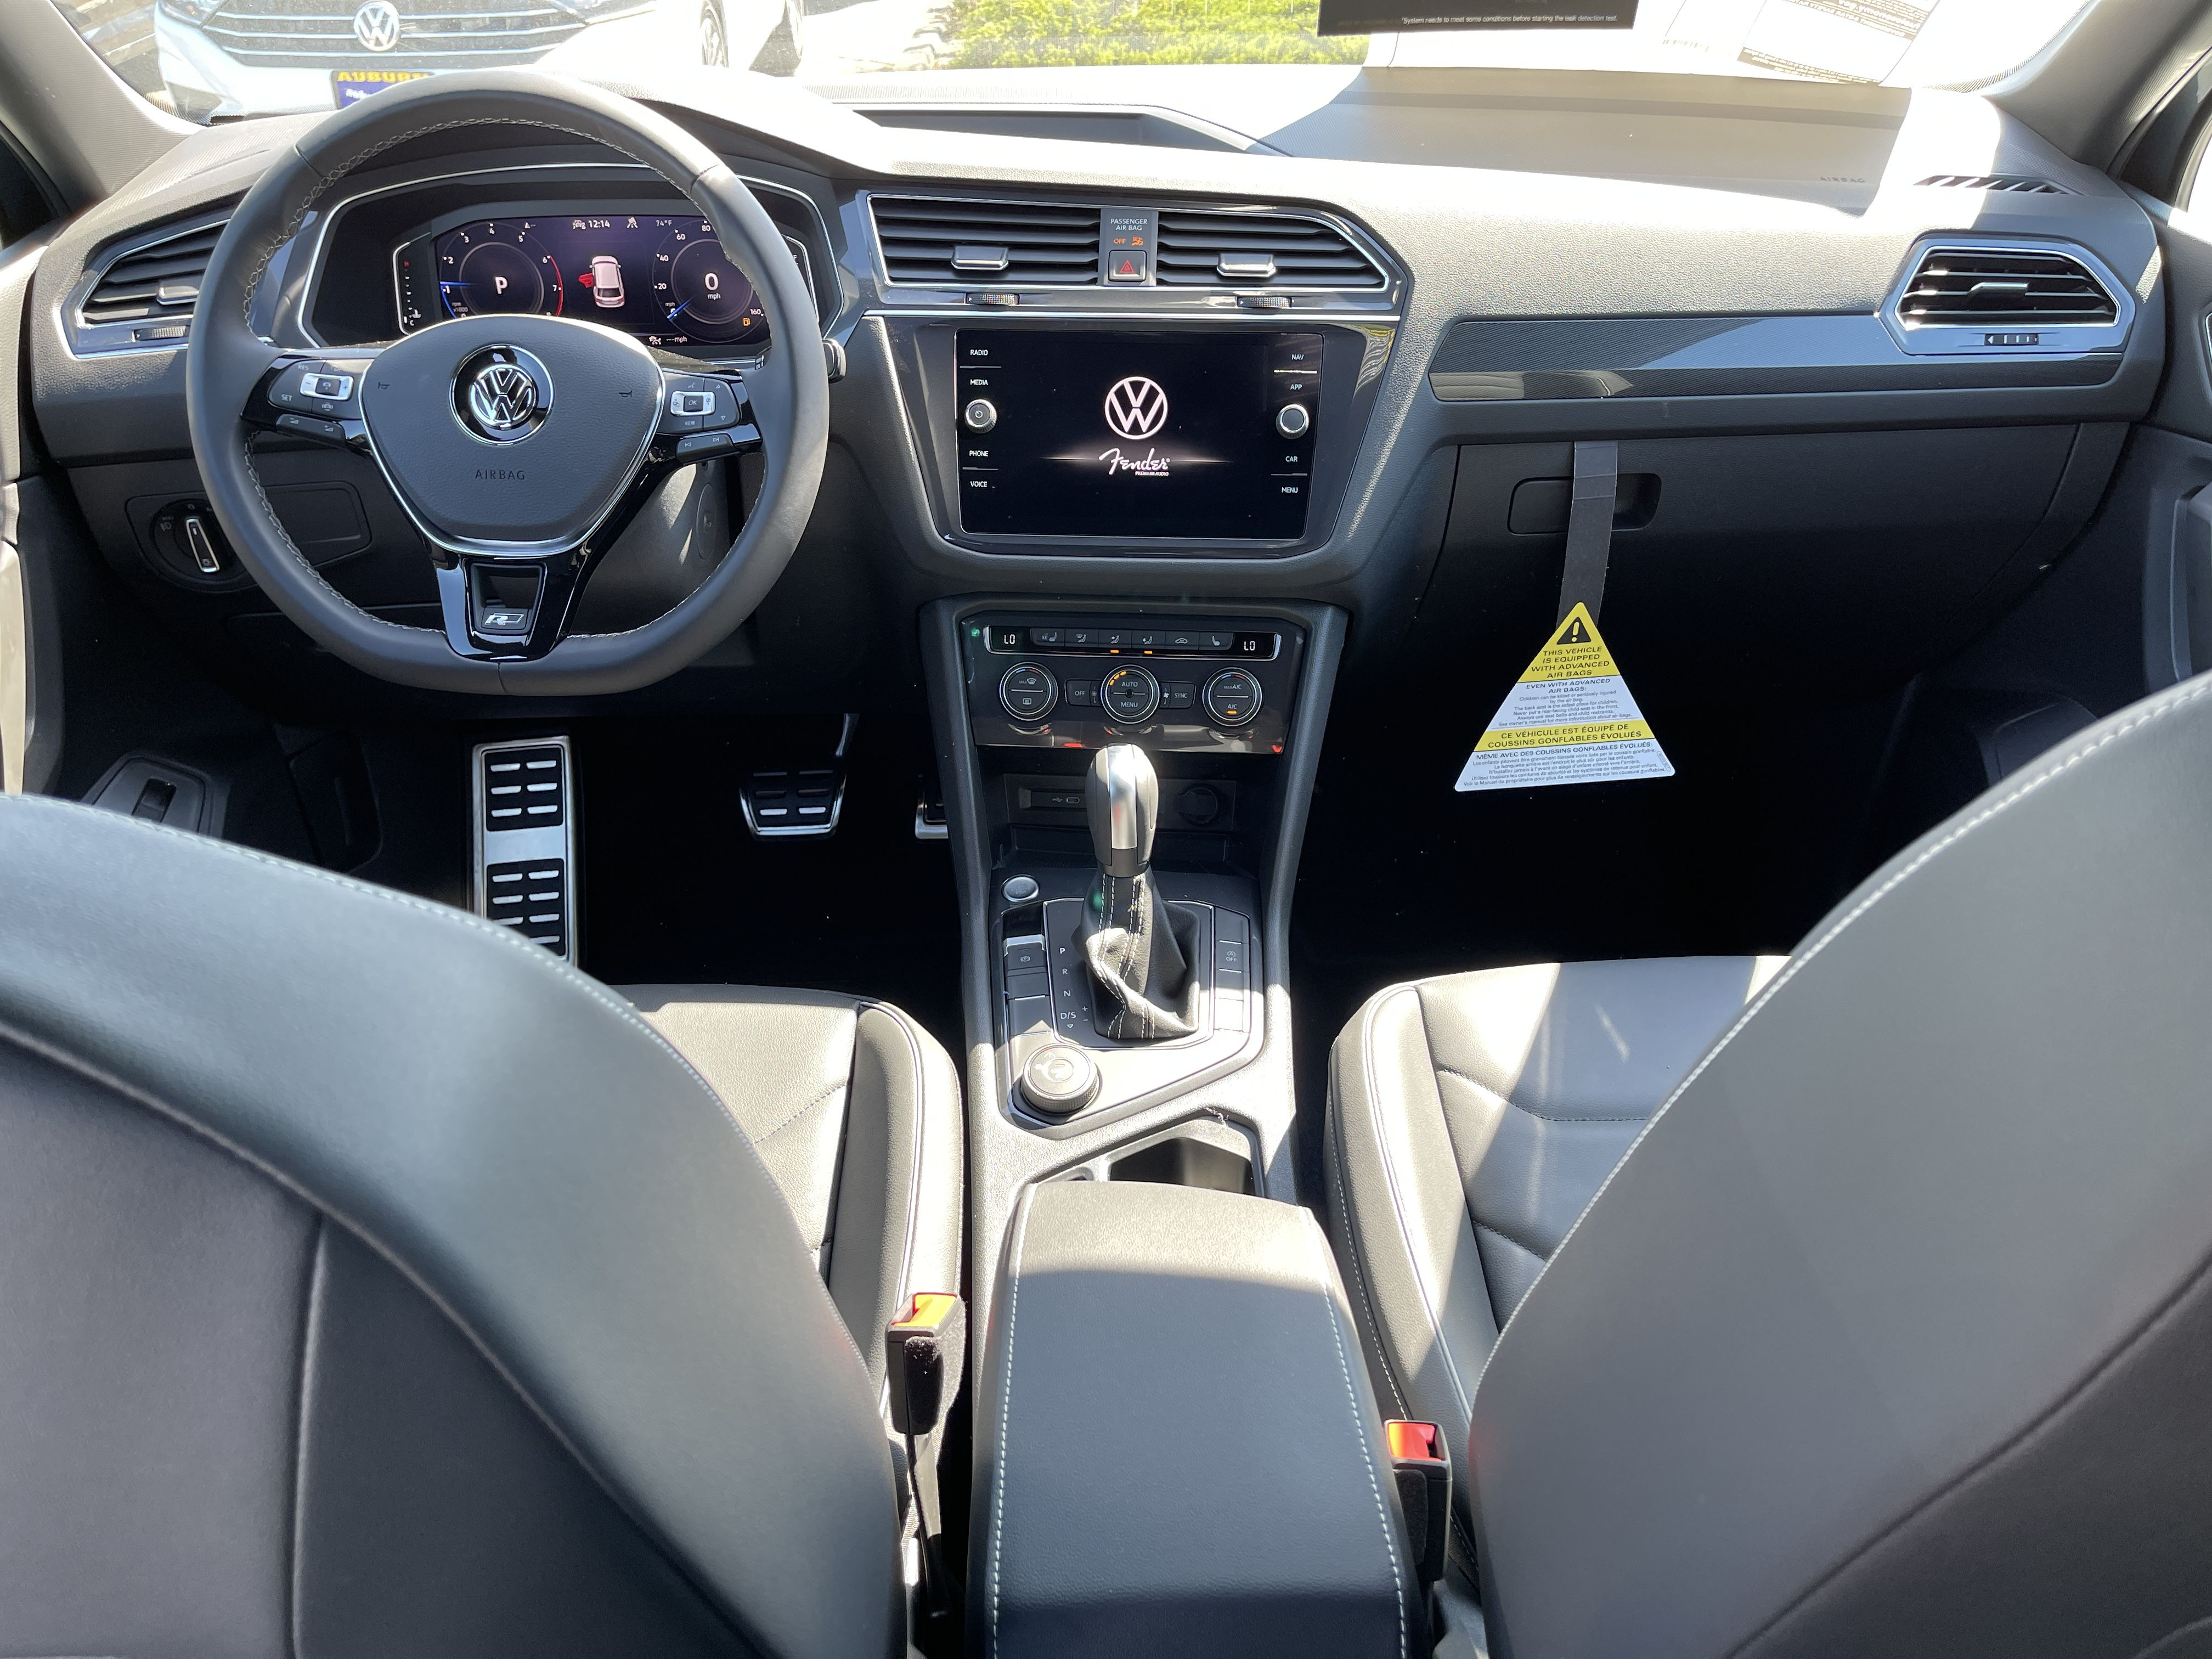 New 2021 Volkswagen Tiguan 2.0T SEL Premium R-Line 4Motion ...